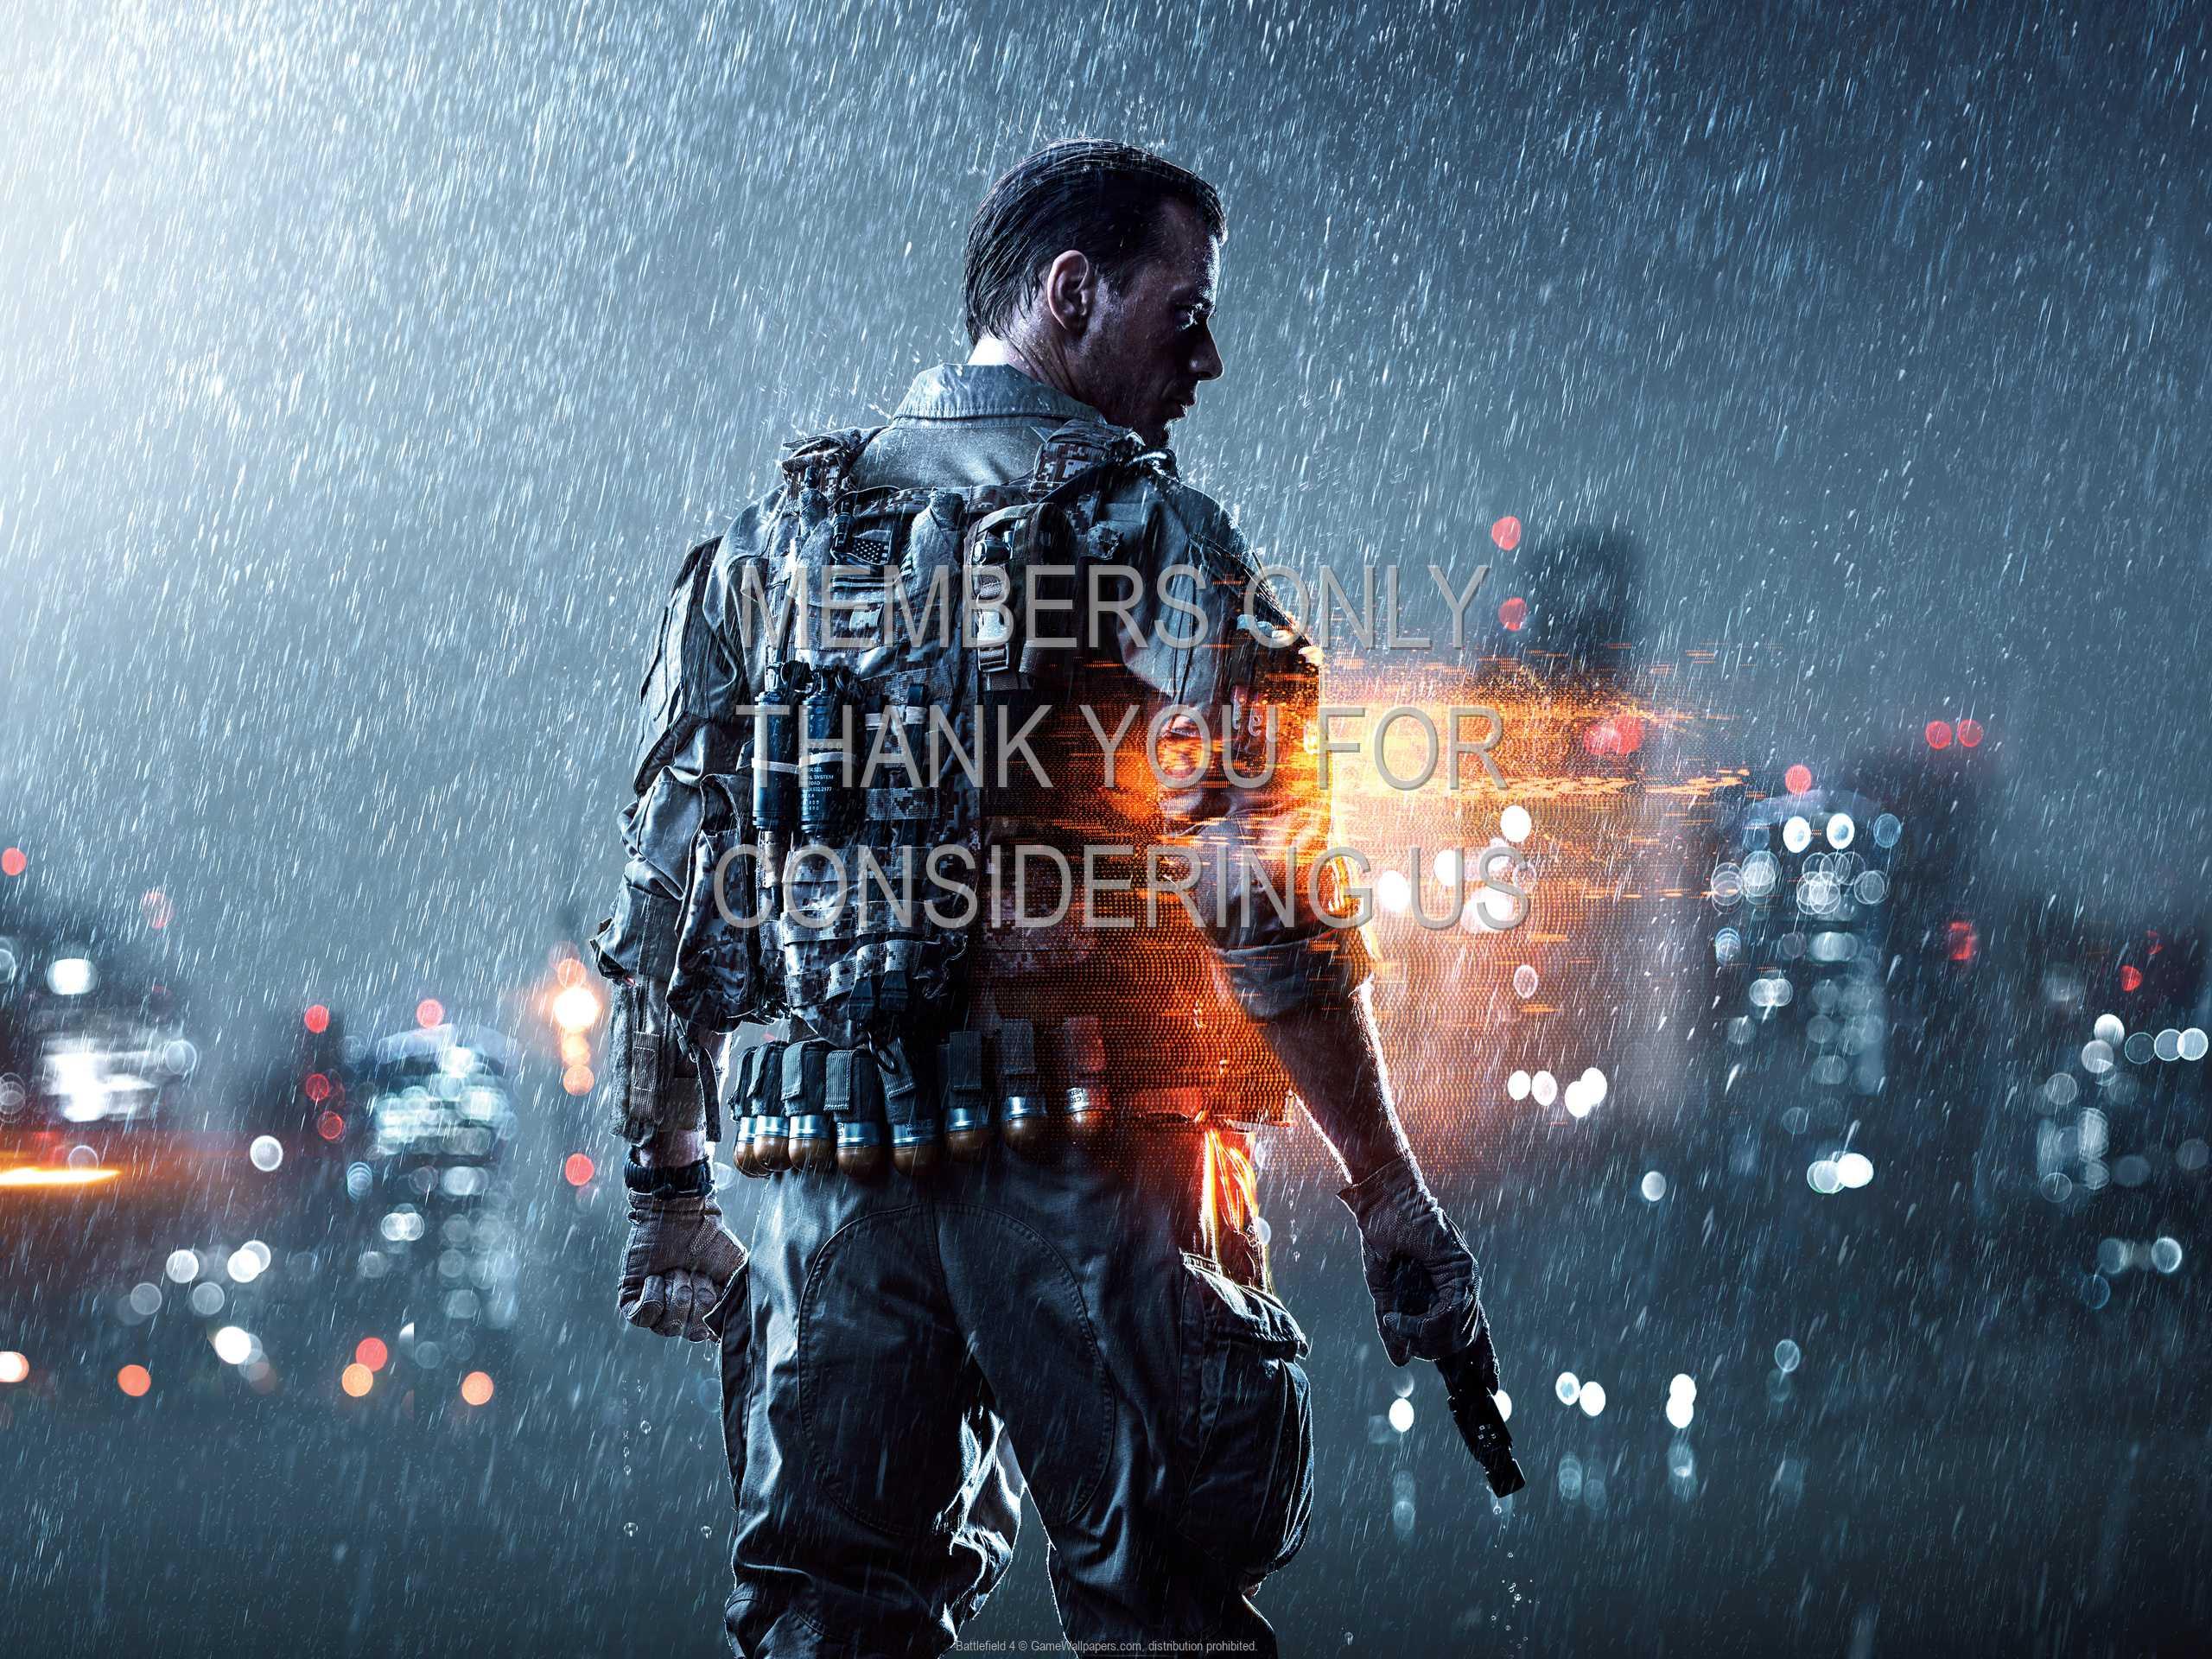 Battlefield 4 1080p Horizontal Mobile fond d'écran 03